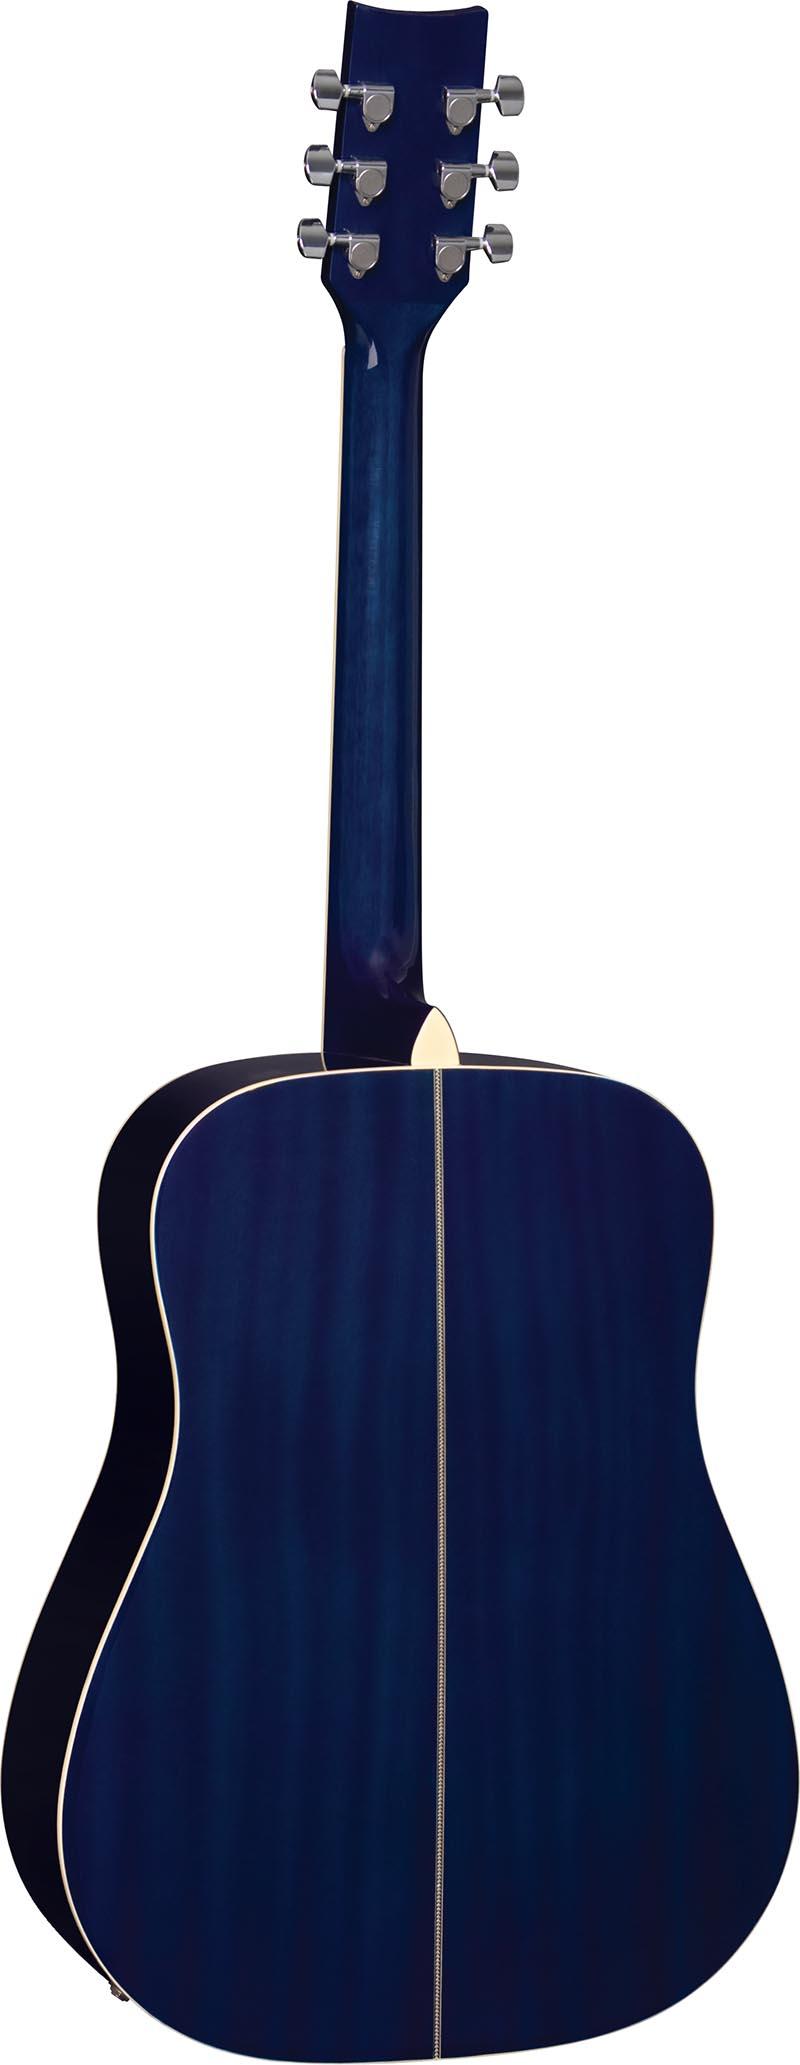 ch887 violao folk dreadnought eagle ch887 bls azul sunburst visao posterior vertical